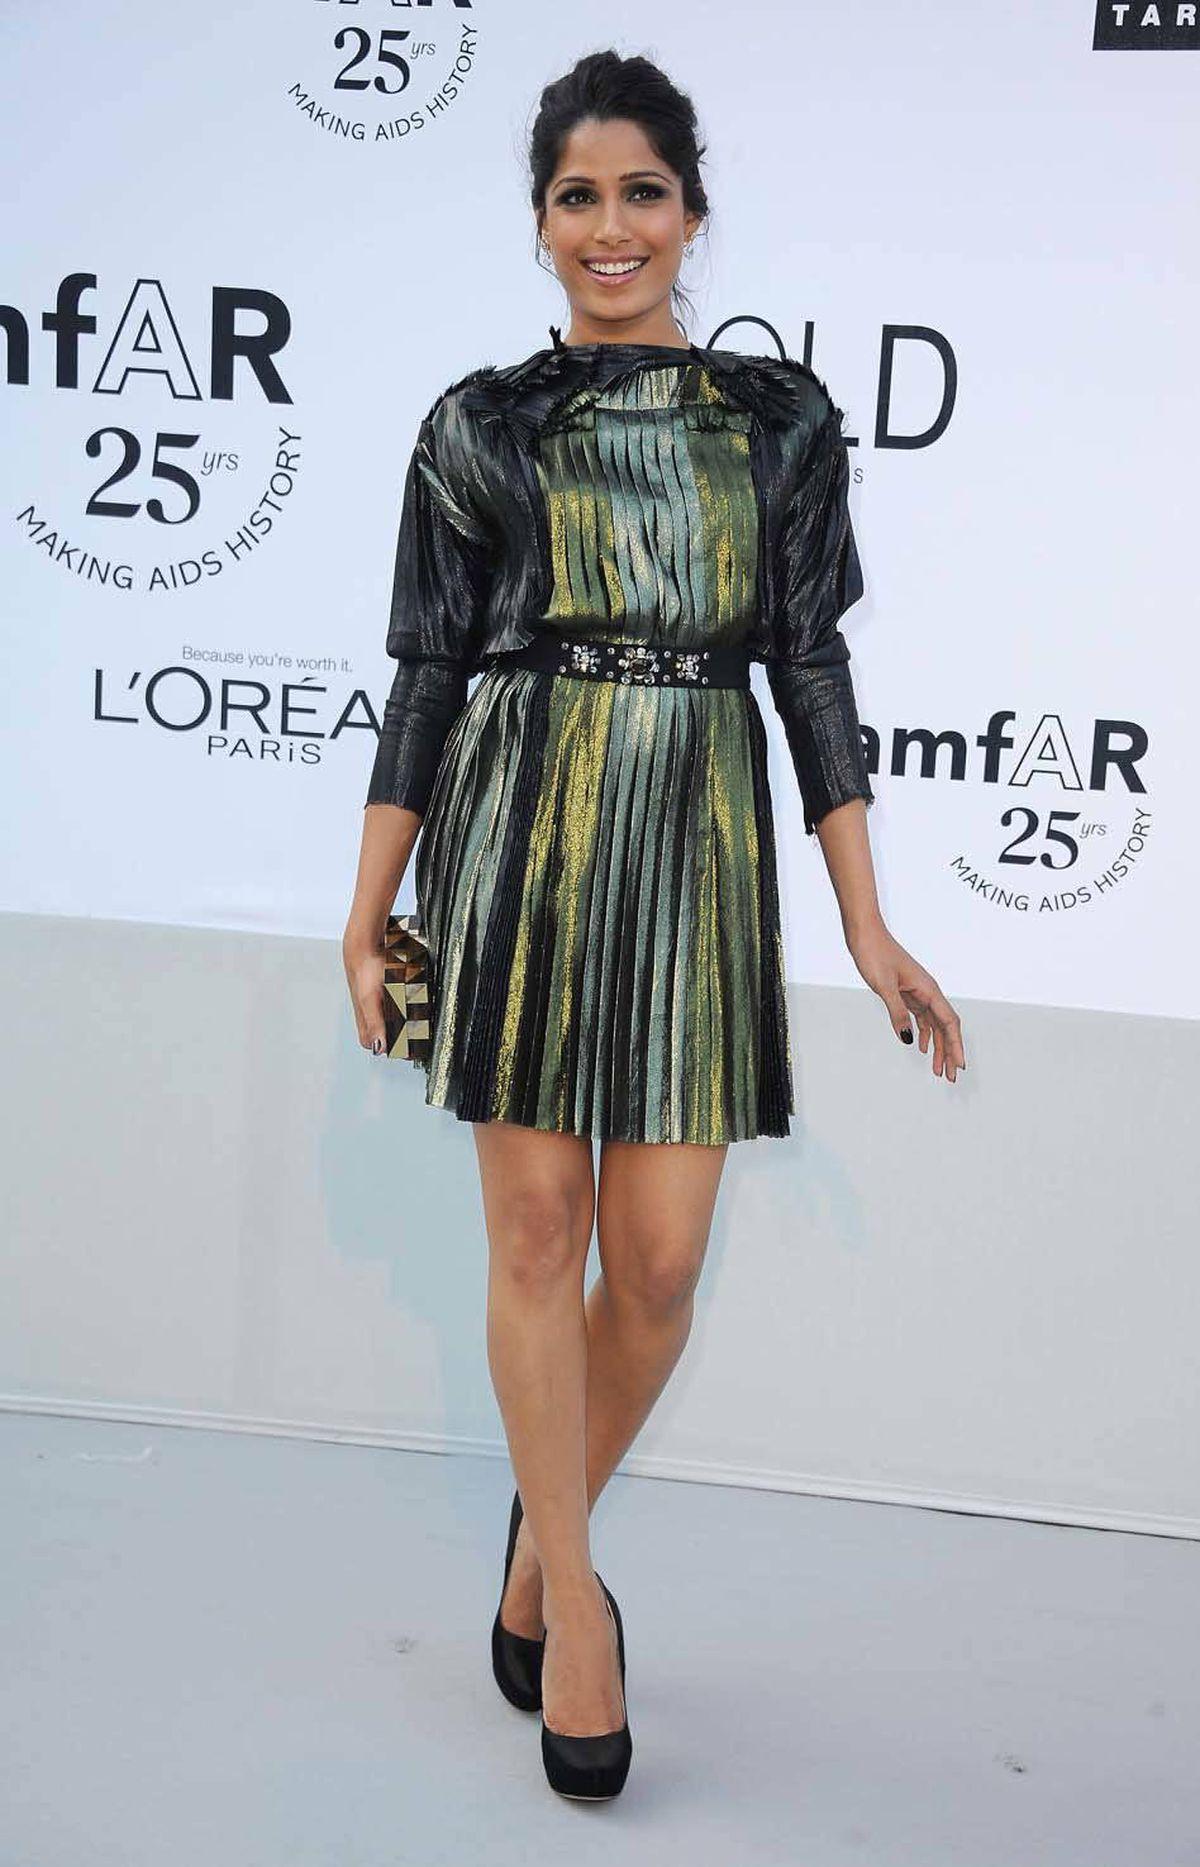 Freida Pinto attends amfAR's Cinema Against AIDS Gala at the Cannes Film Festival on Thursday.